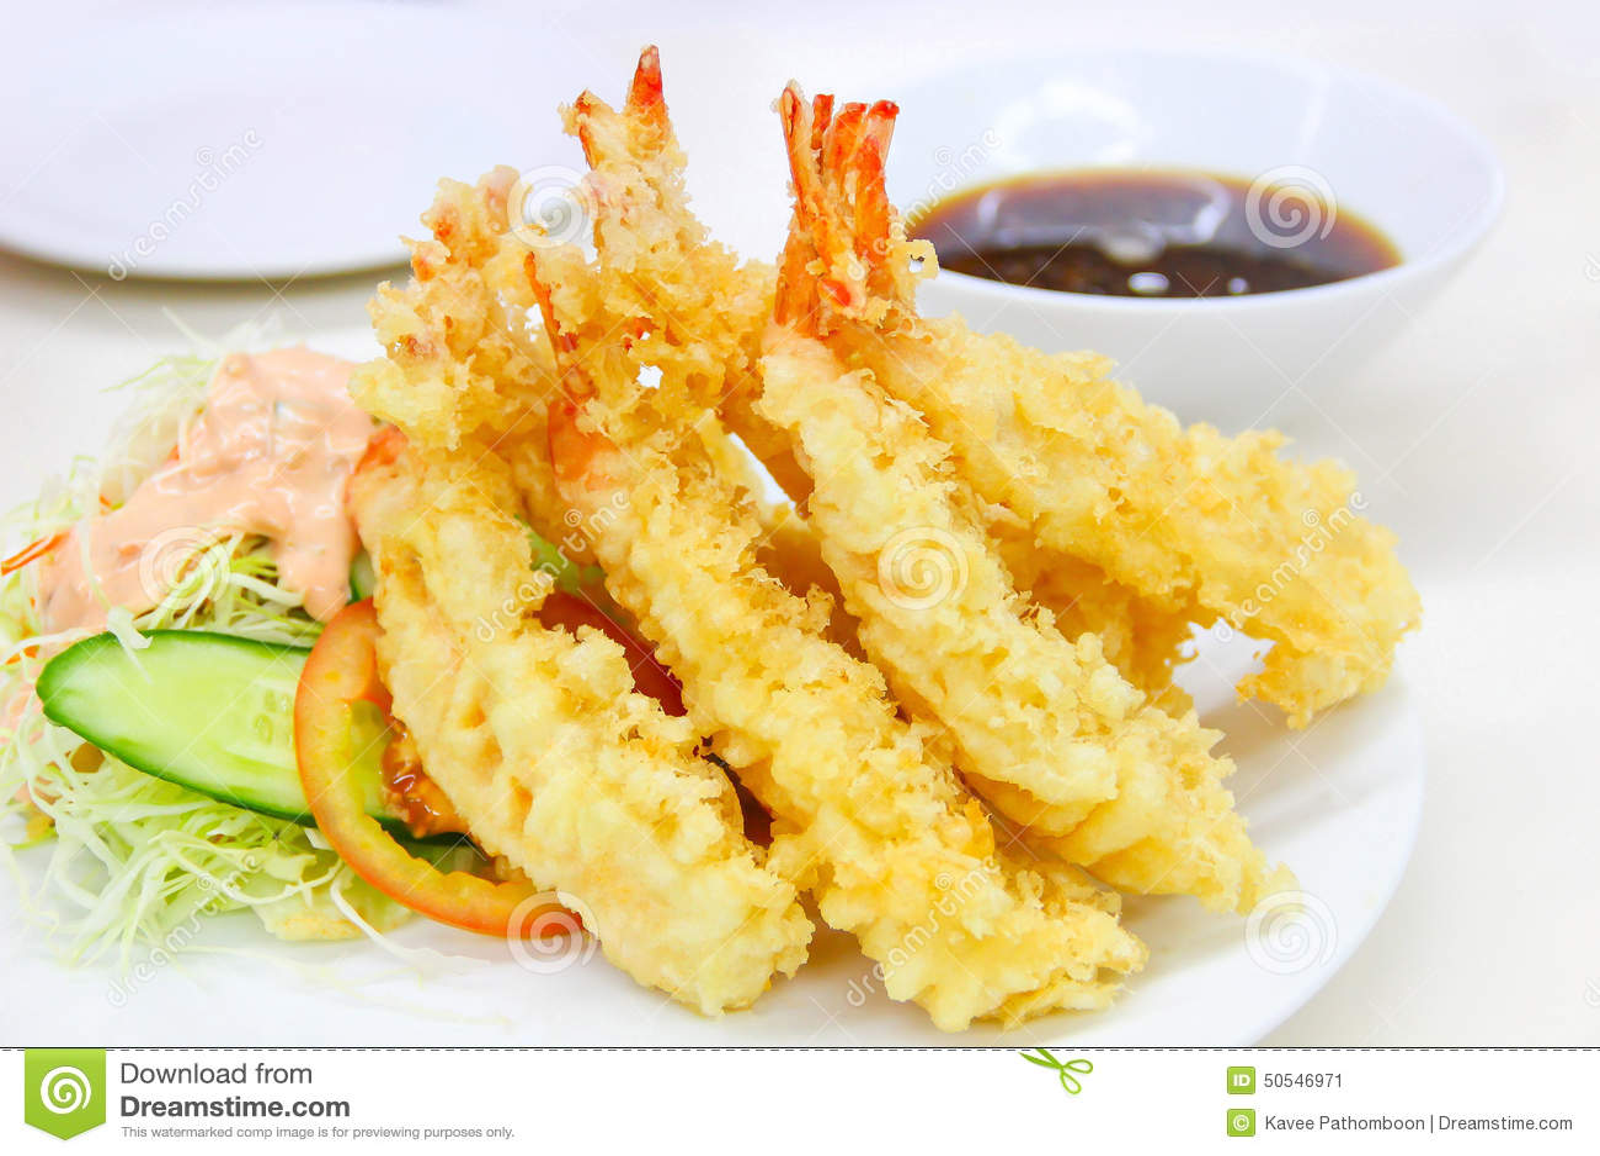 Japanese Cuisine - Tempura Shrimps (Deep Fried Shrimps) with sauce.